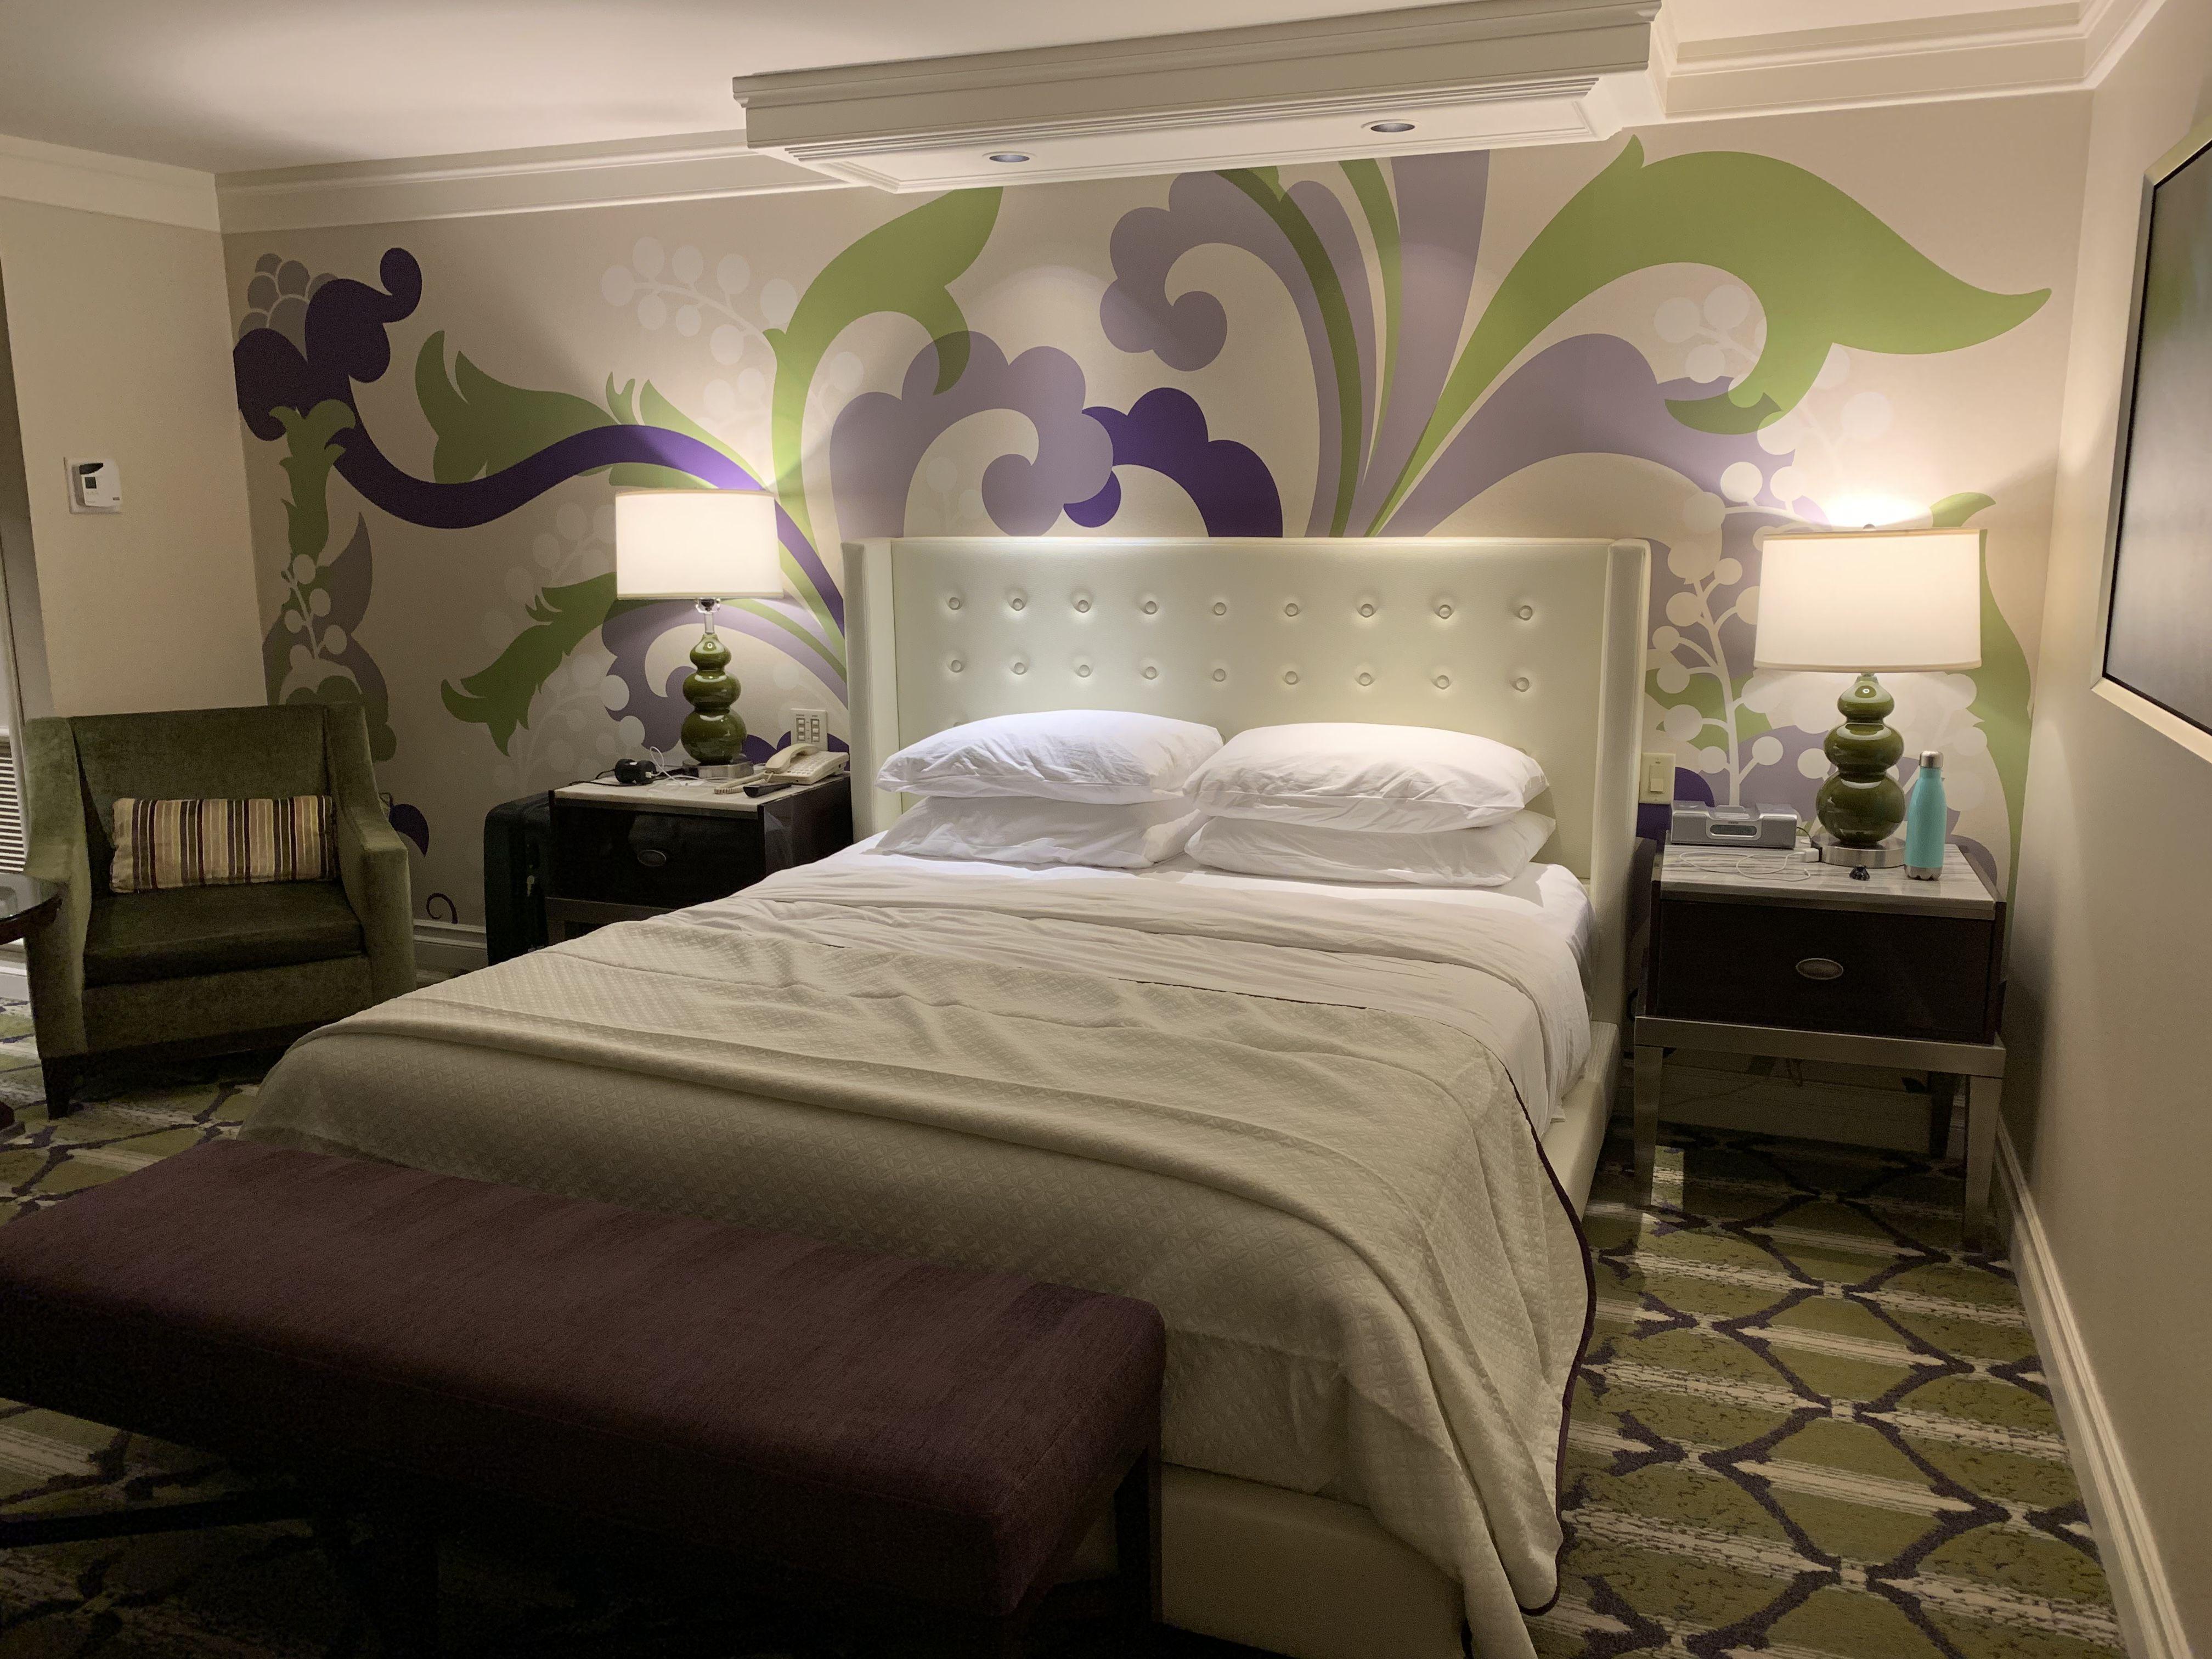 Bellagio Fountain View Room Journey With Erika Bellagio Hotel Las Vegas Las Vegas Rooms Room